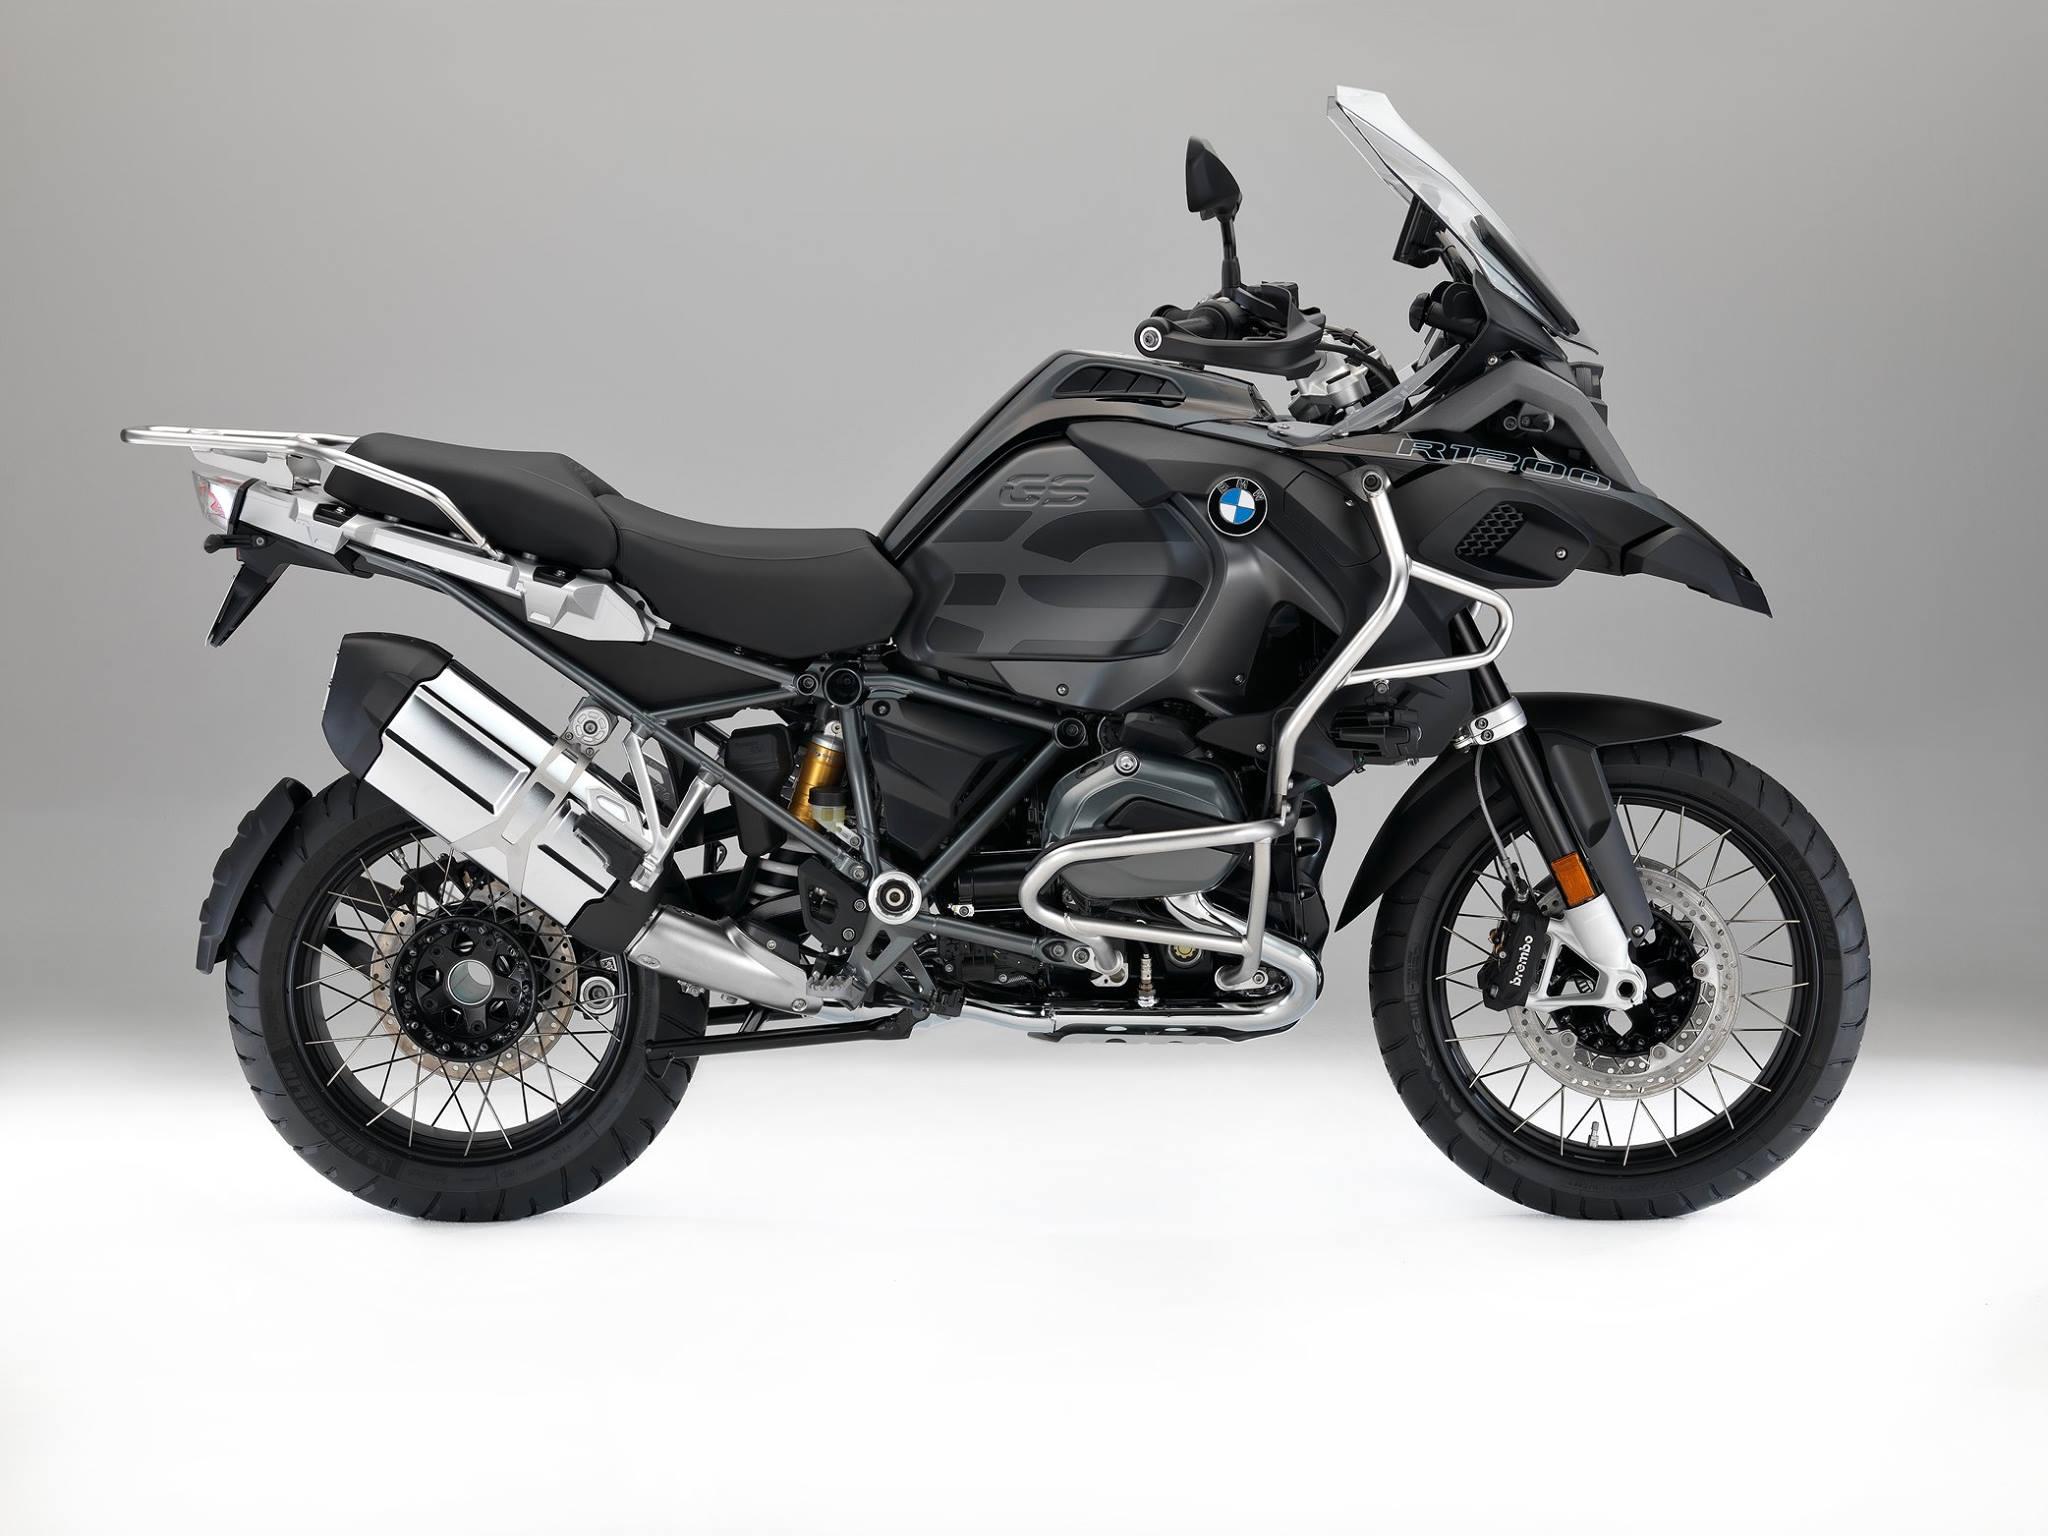 Alan Black – BMW R1200GS Adventure